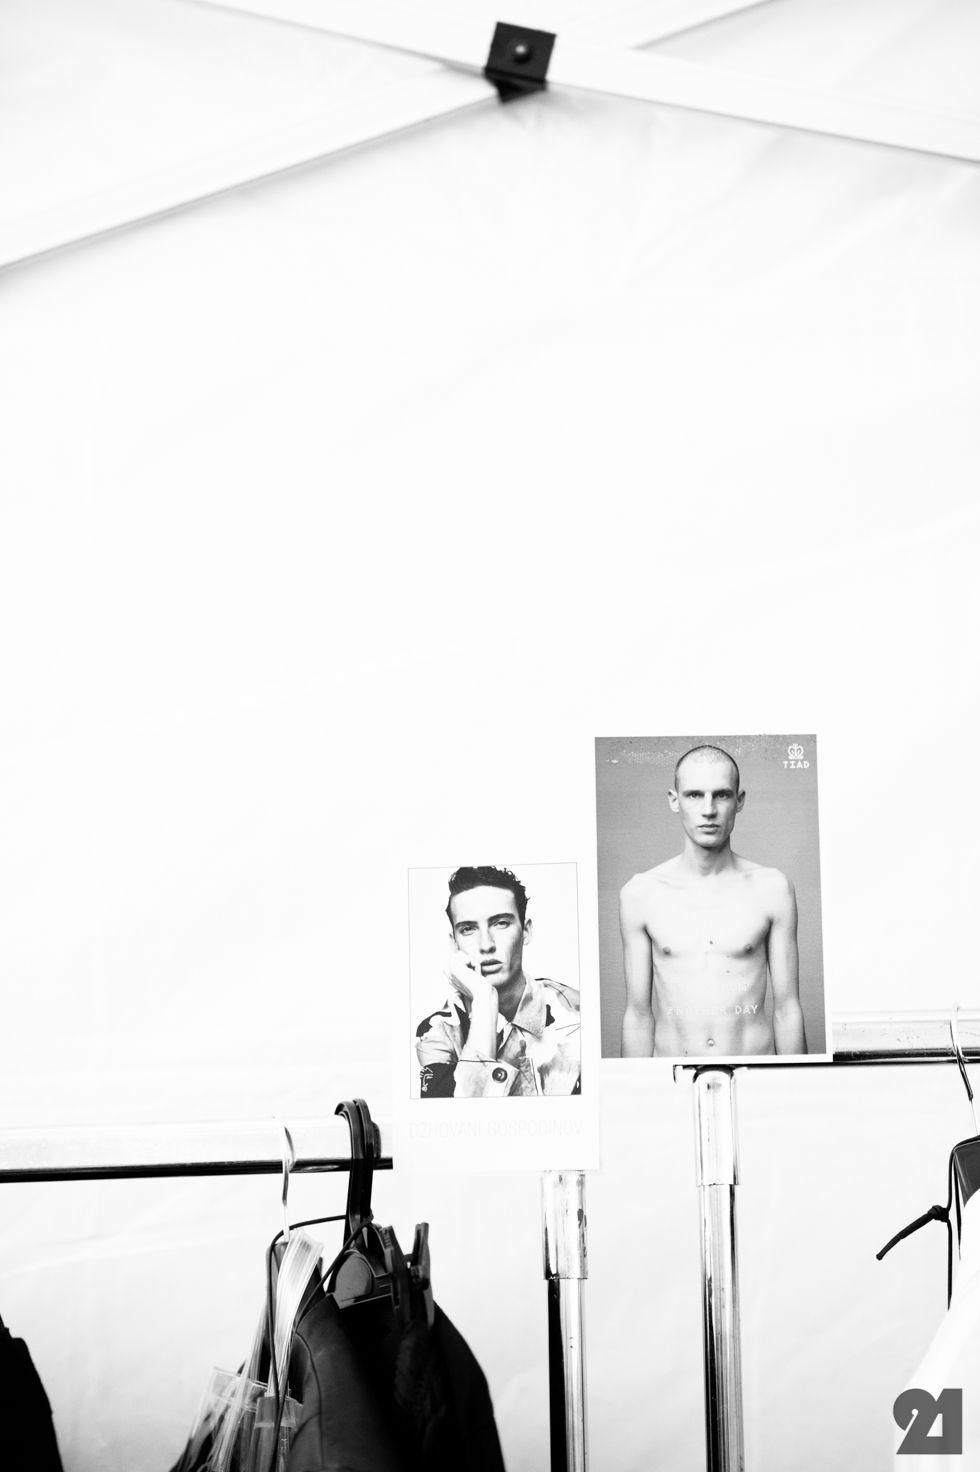 Le 21ème / Backstage at Julius _7, Spring/Summer 2016 | Paris  // #Fashion, #FashionBlog, #FashionBlogger, #Ootd, #OutfitOfTheDay, #StreetStyle, #Style